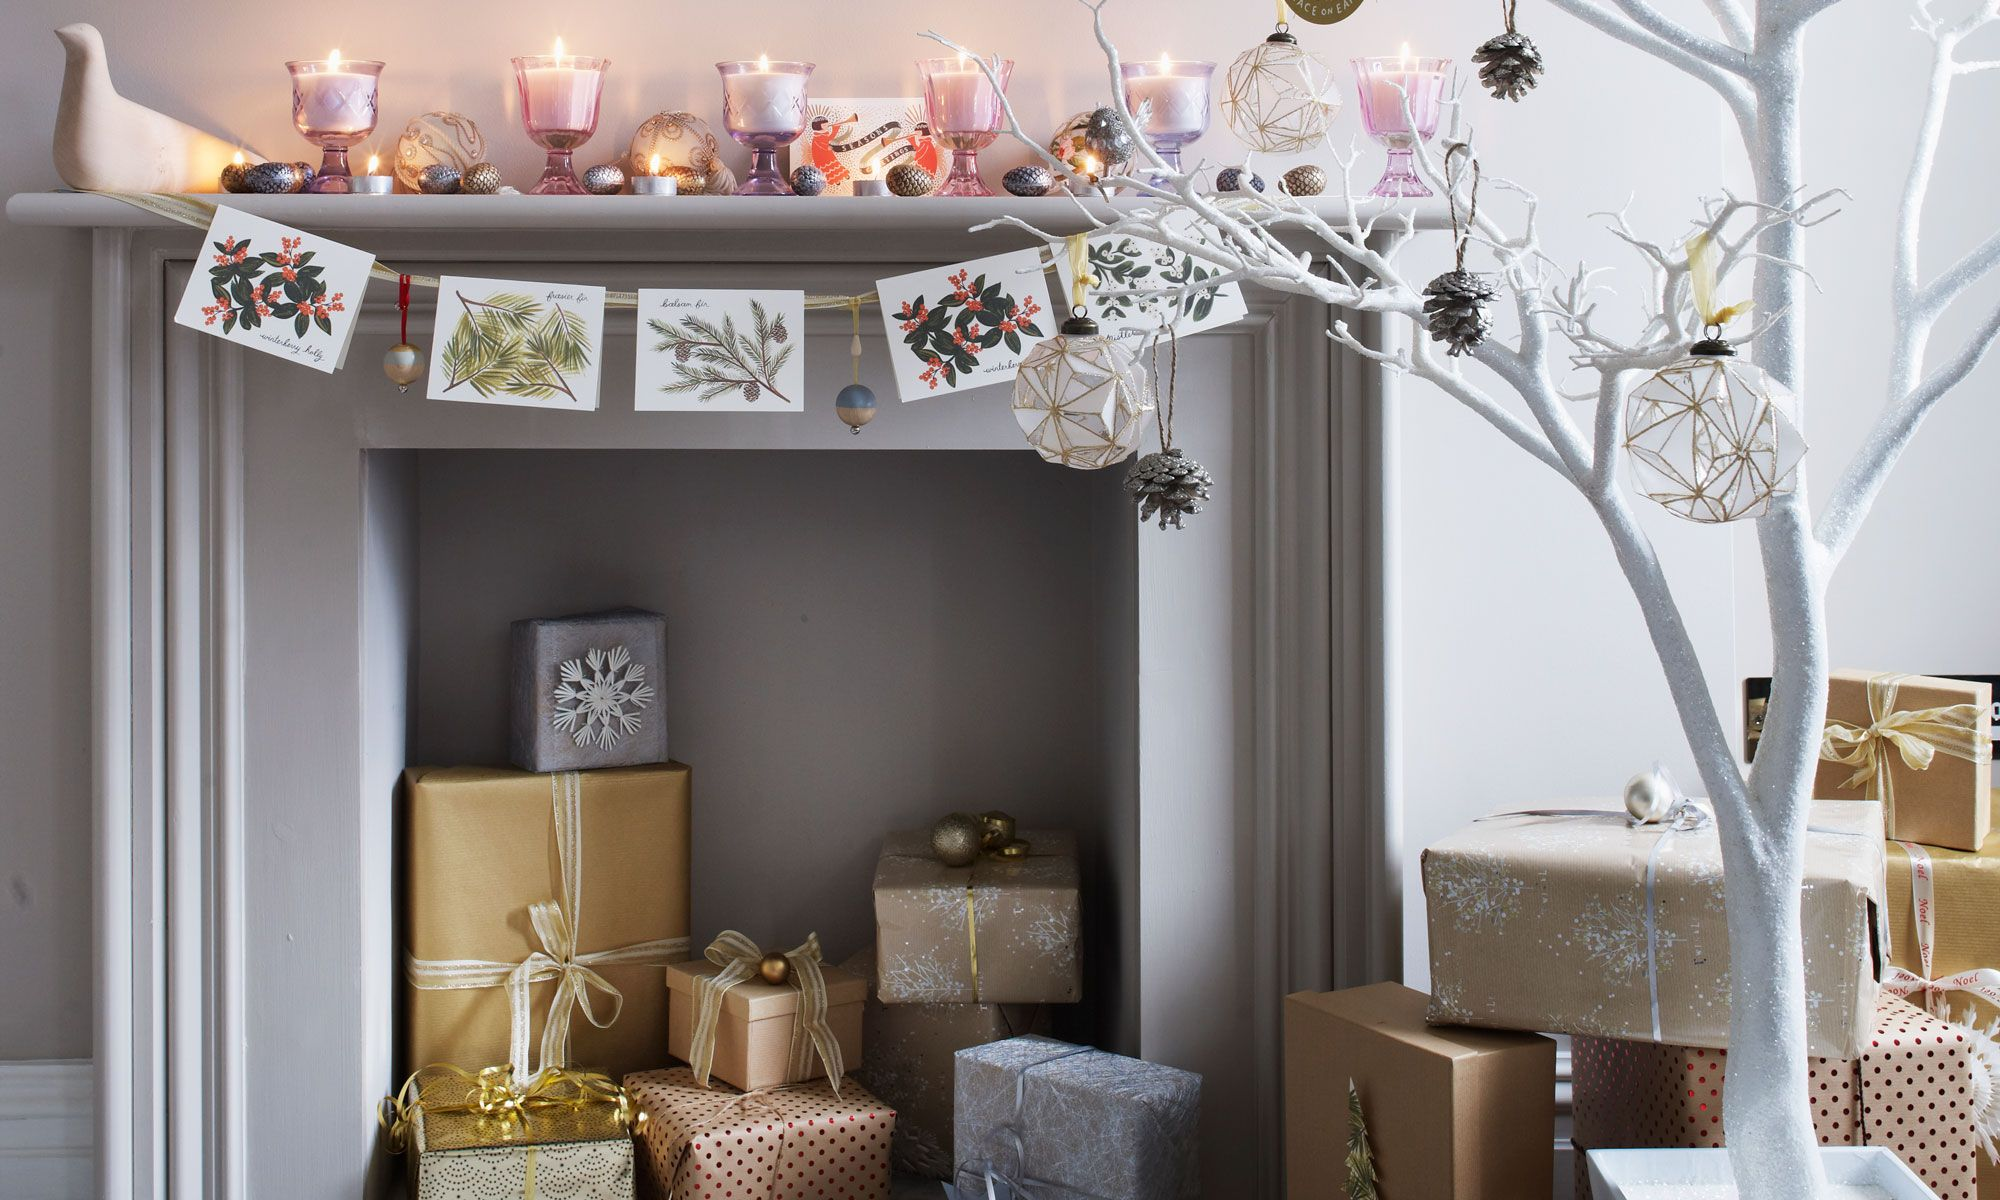 Living Room Christmas House Decorations Inside.41 Luxury Decoration Living Room Ideas Festooning Perfect